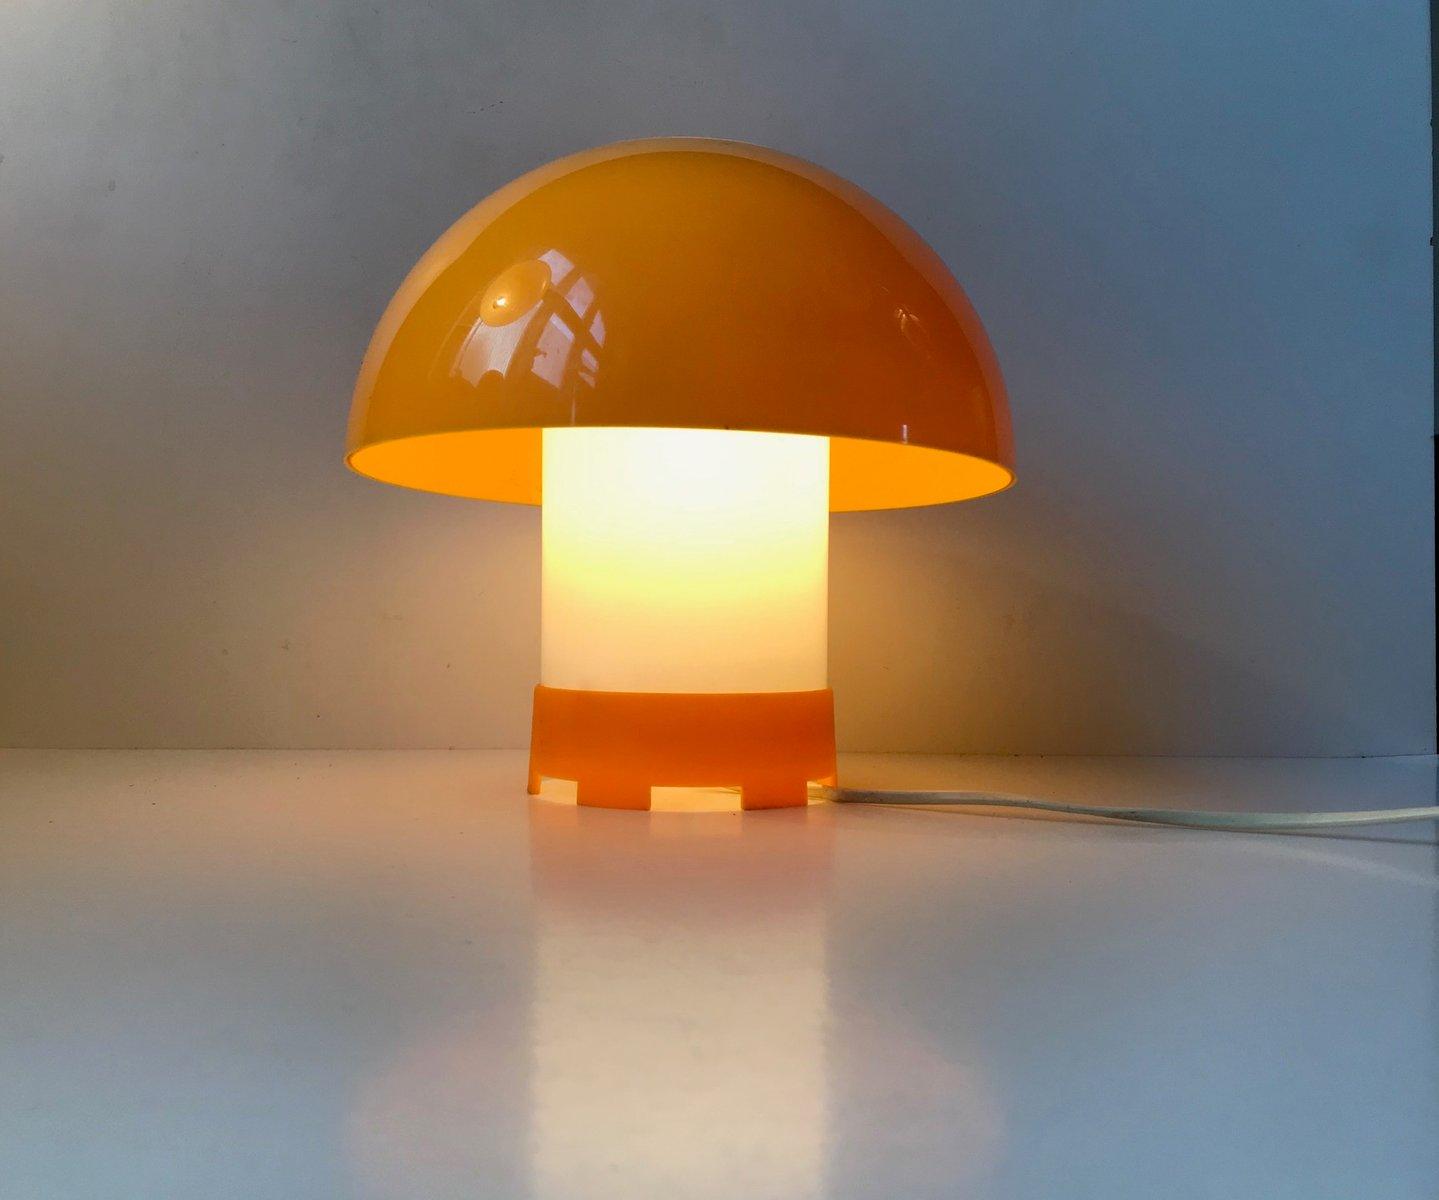 lampe de bureau jaune par bent karlby pour ask belysninger danemark 1970s en vente sur pamono. Black Bedroom Furniture Sets. Home Design Ideas